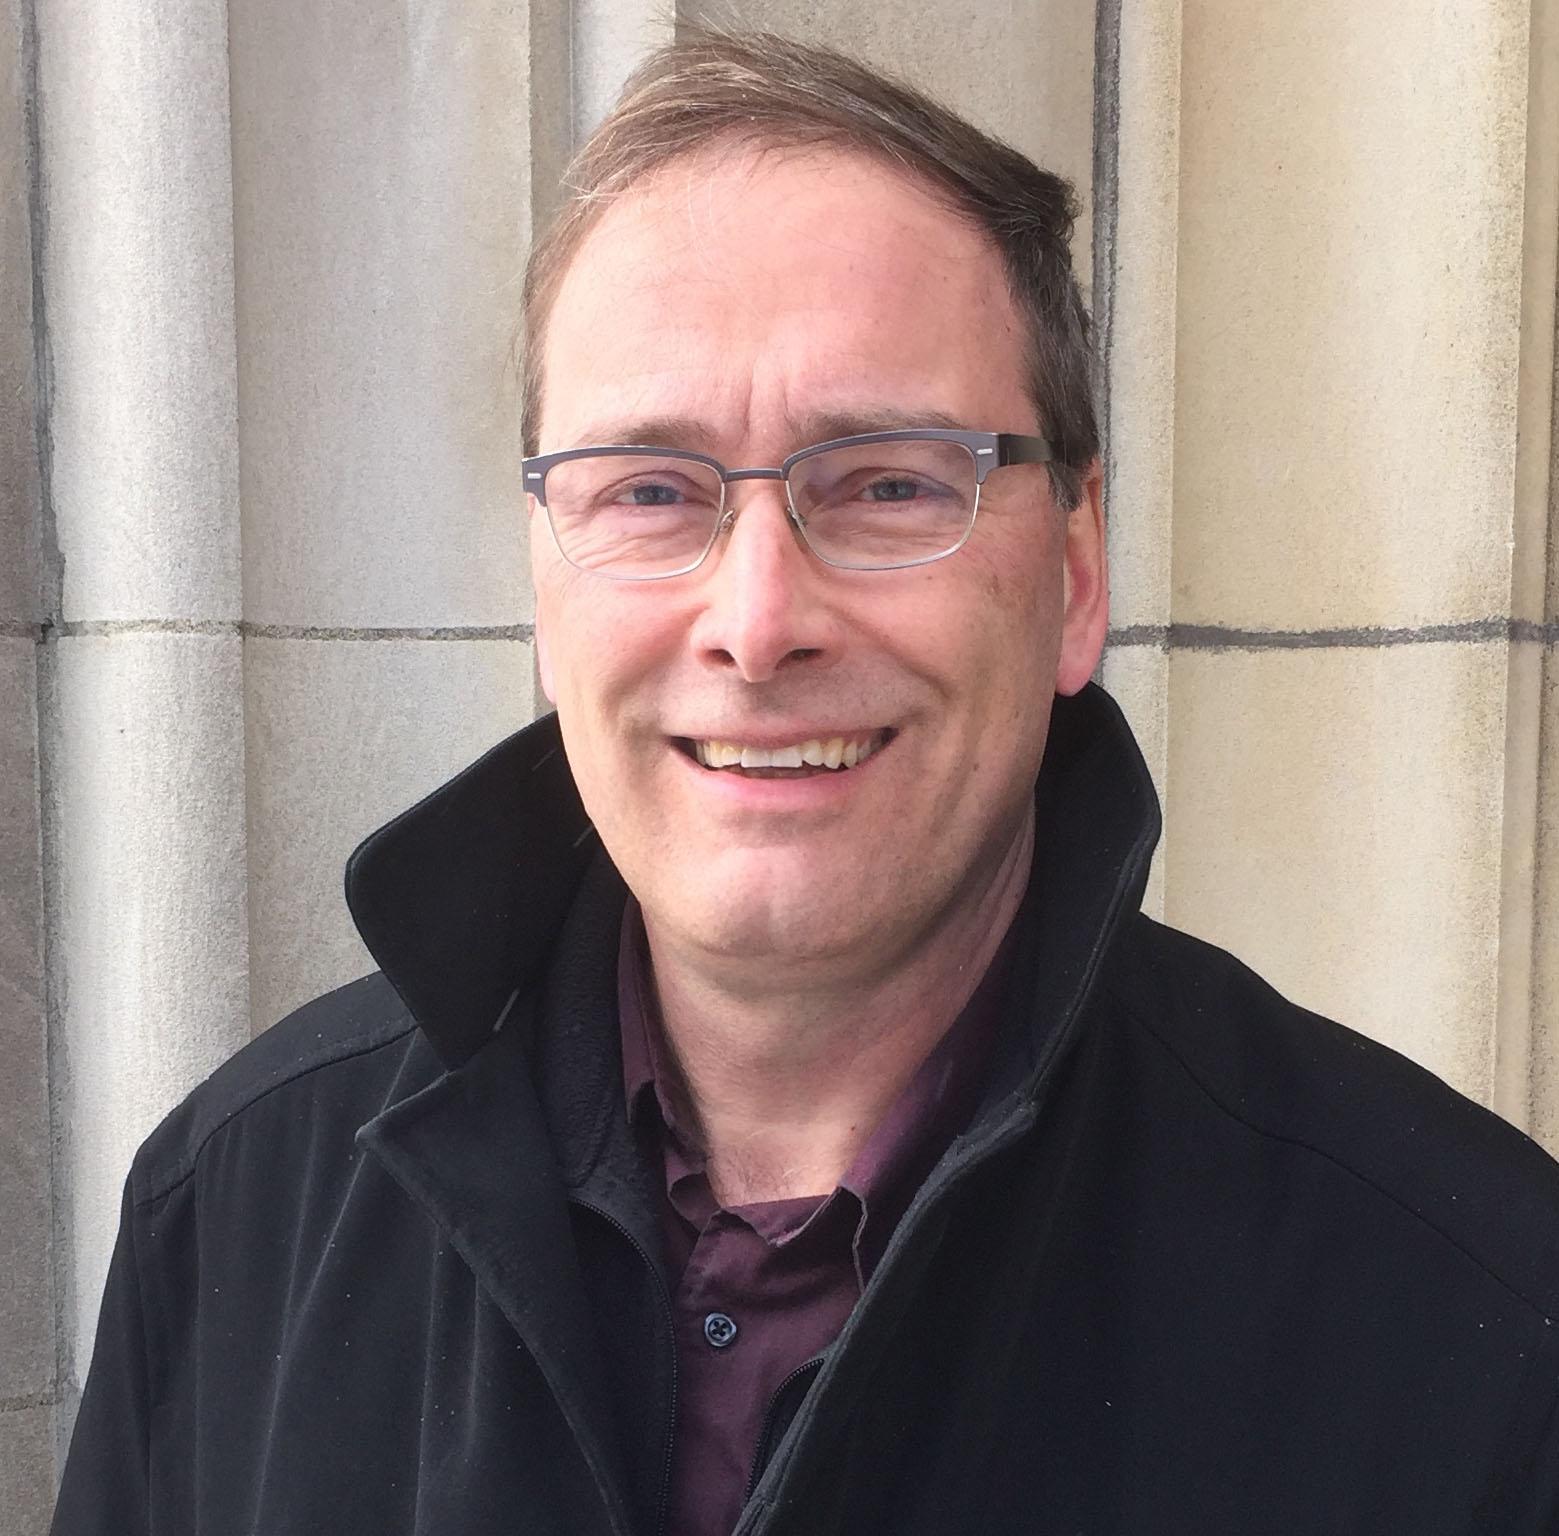 Profile Peter Bischoff